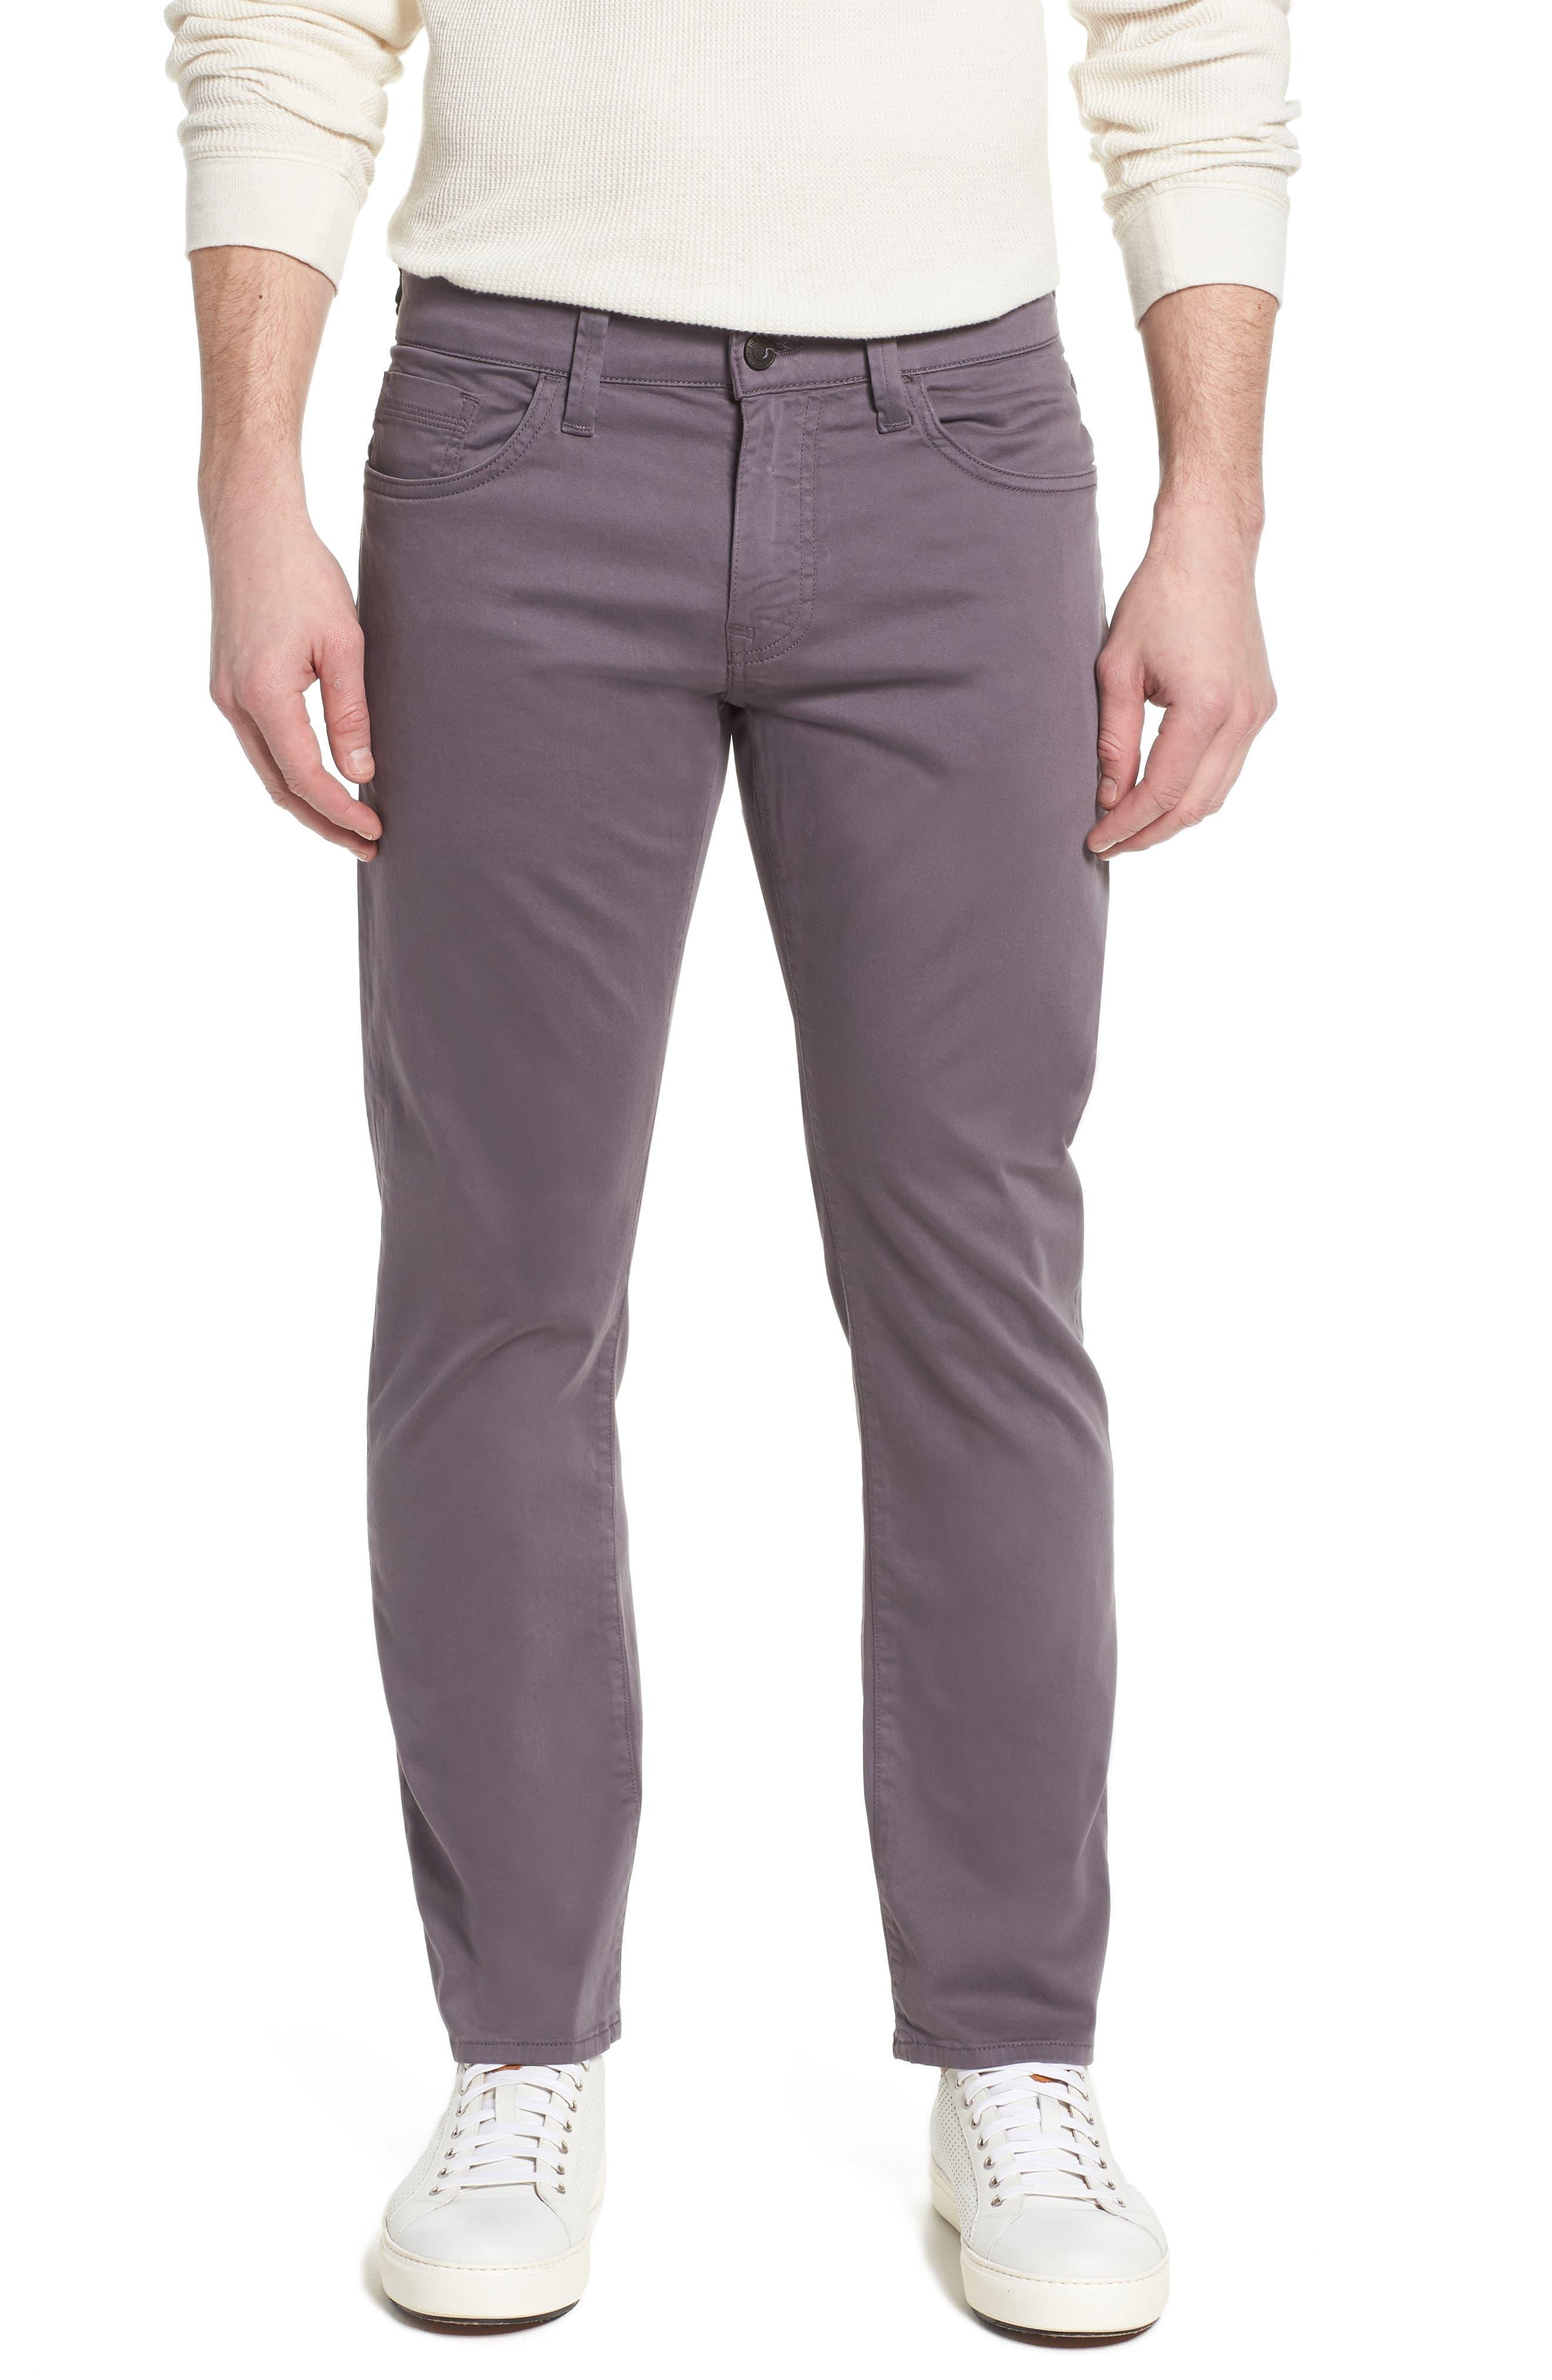 MAVI JEANS Zach Straight Fit Twill Pants, Main, color, 050